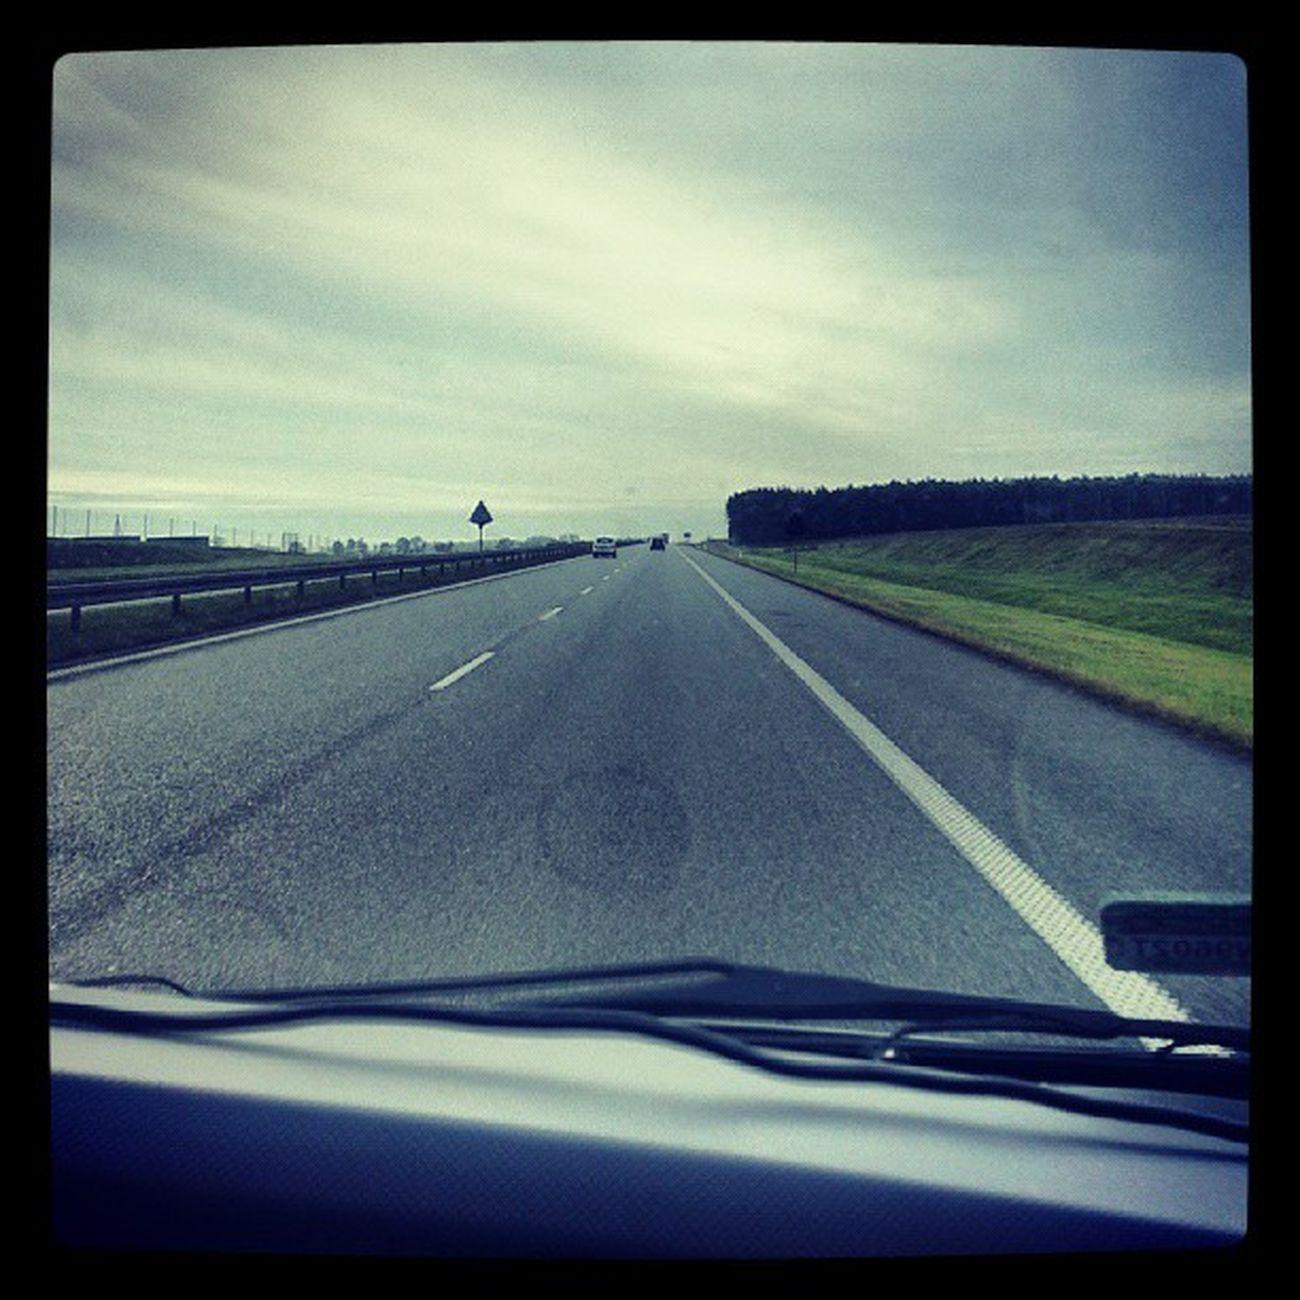 Highway Amber One Amberone gdansk ravenna roadtrip